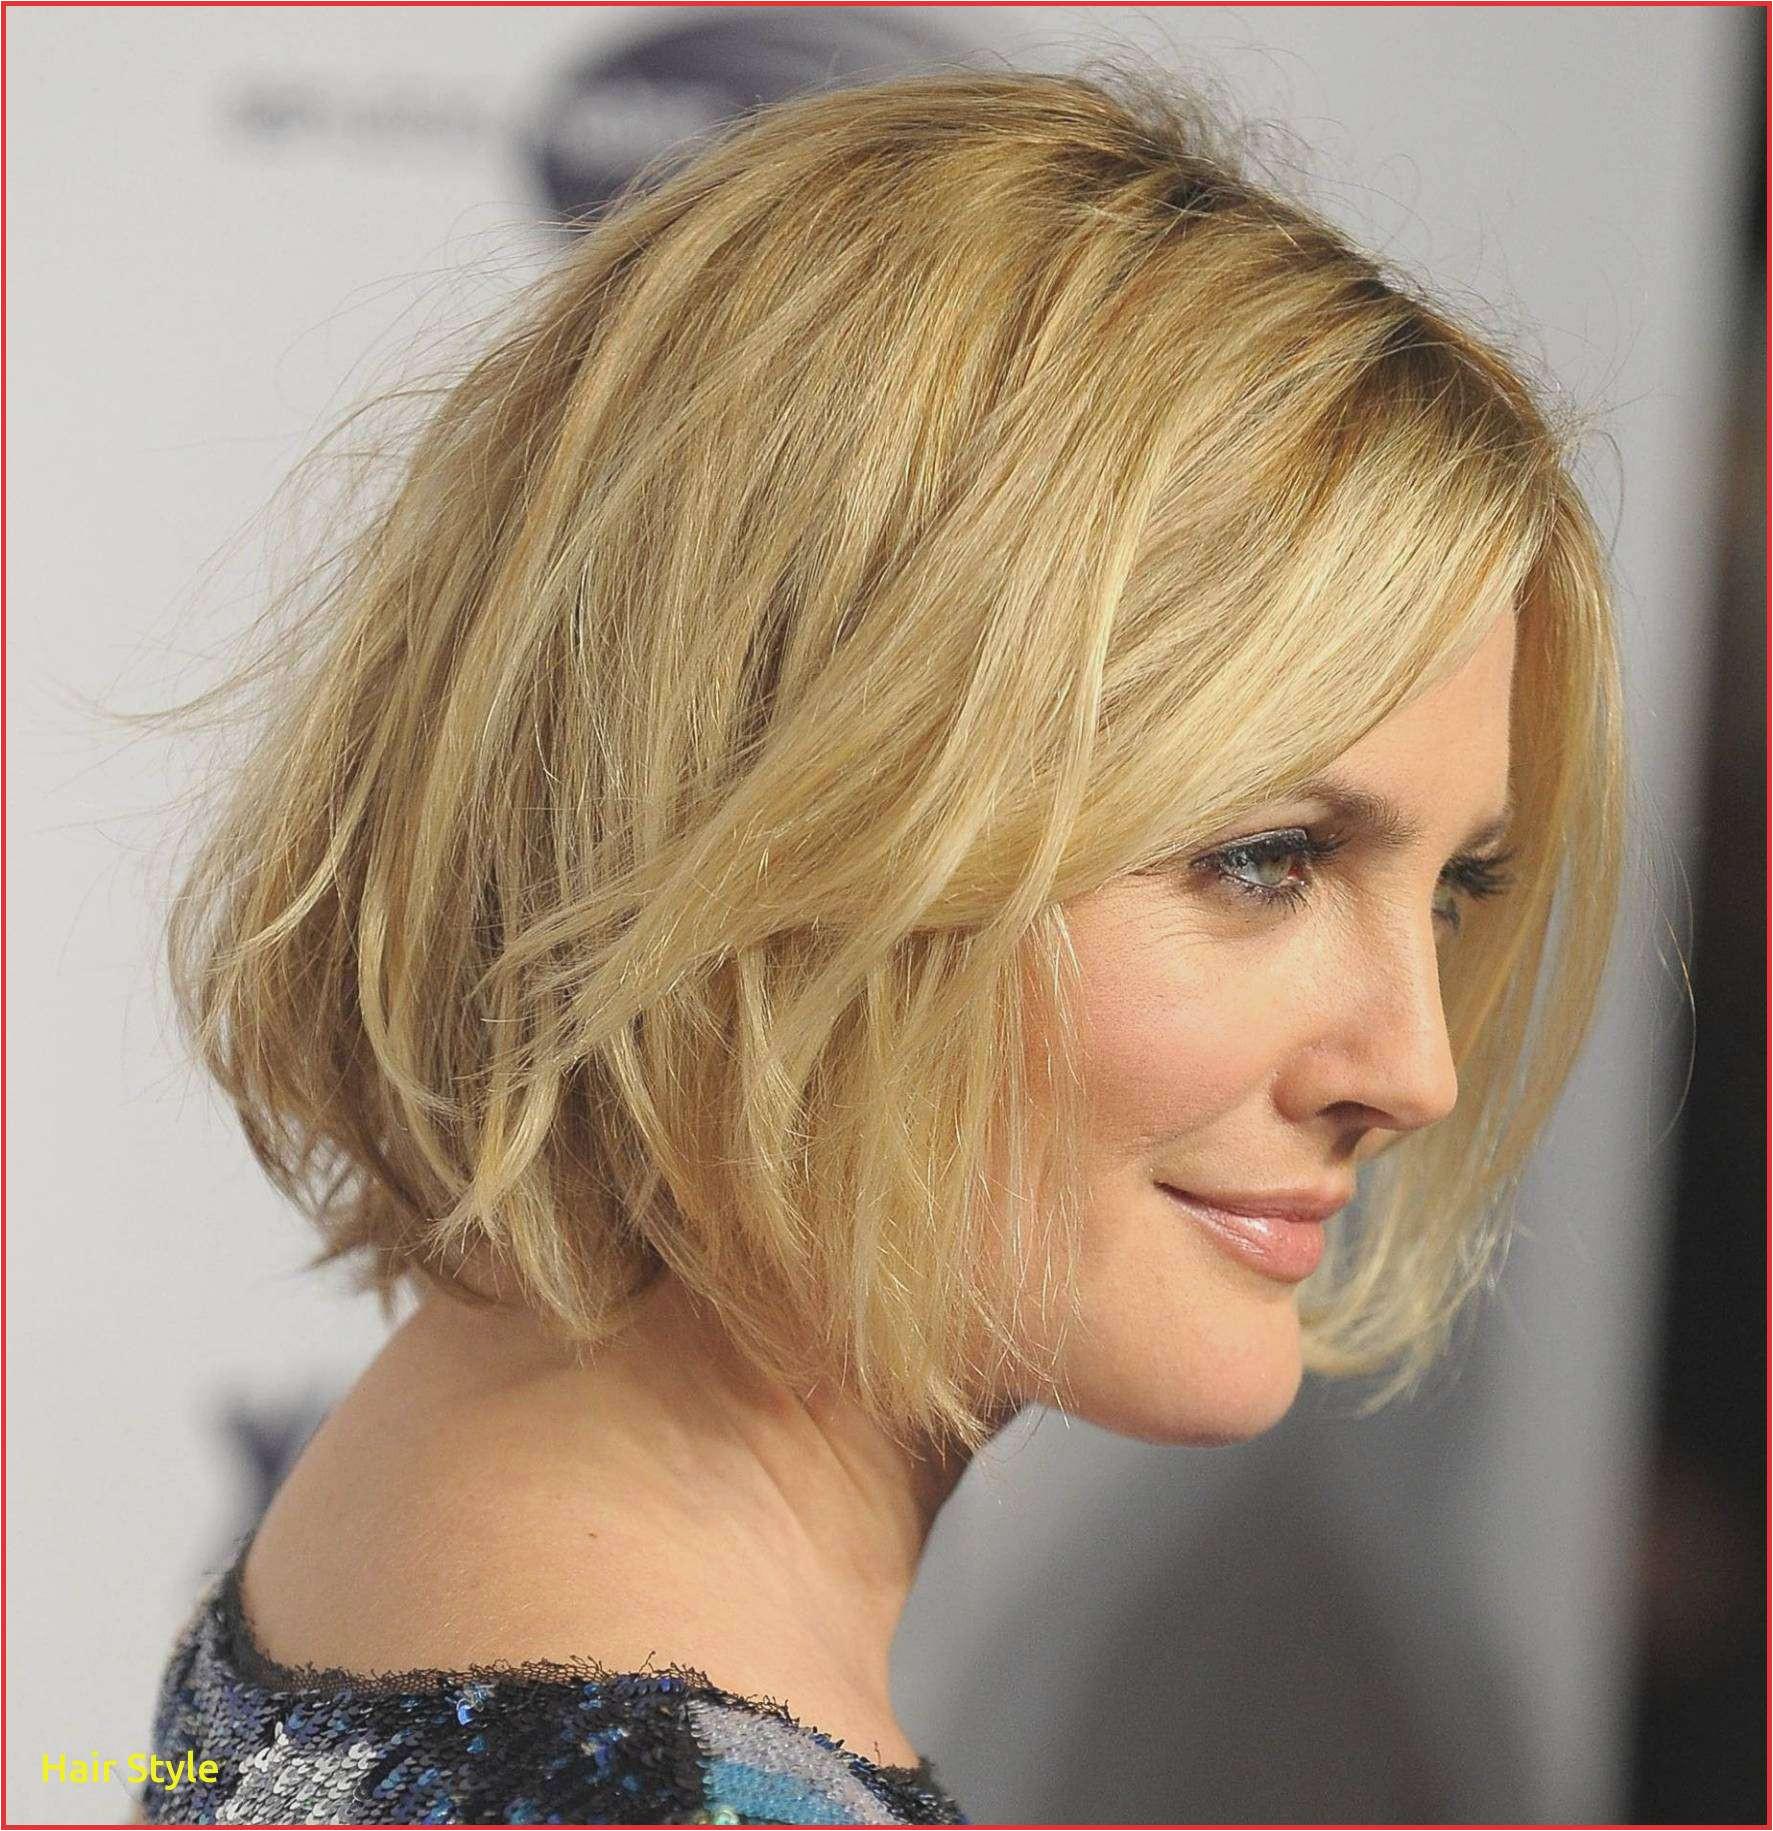 shoulder length hair styles beautiful medium length bob hairstyles new i pinimg 1200x 0d 60 8a